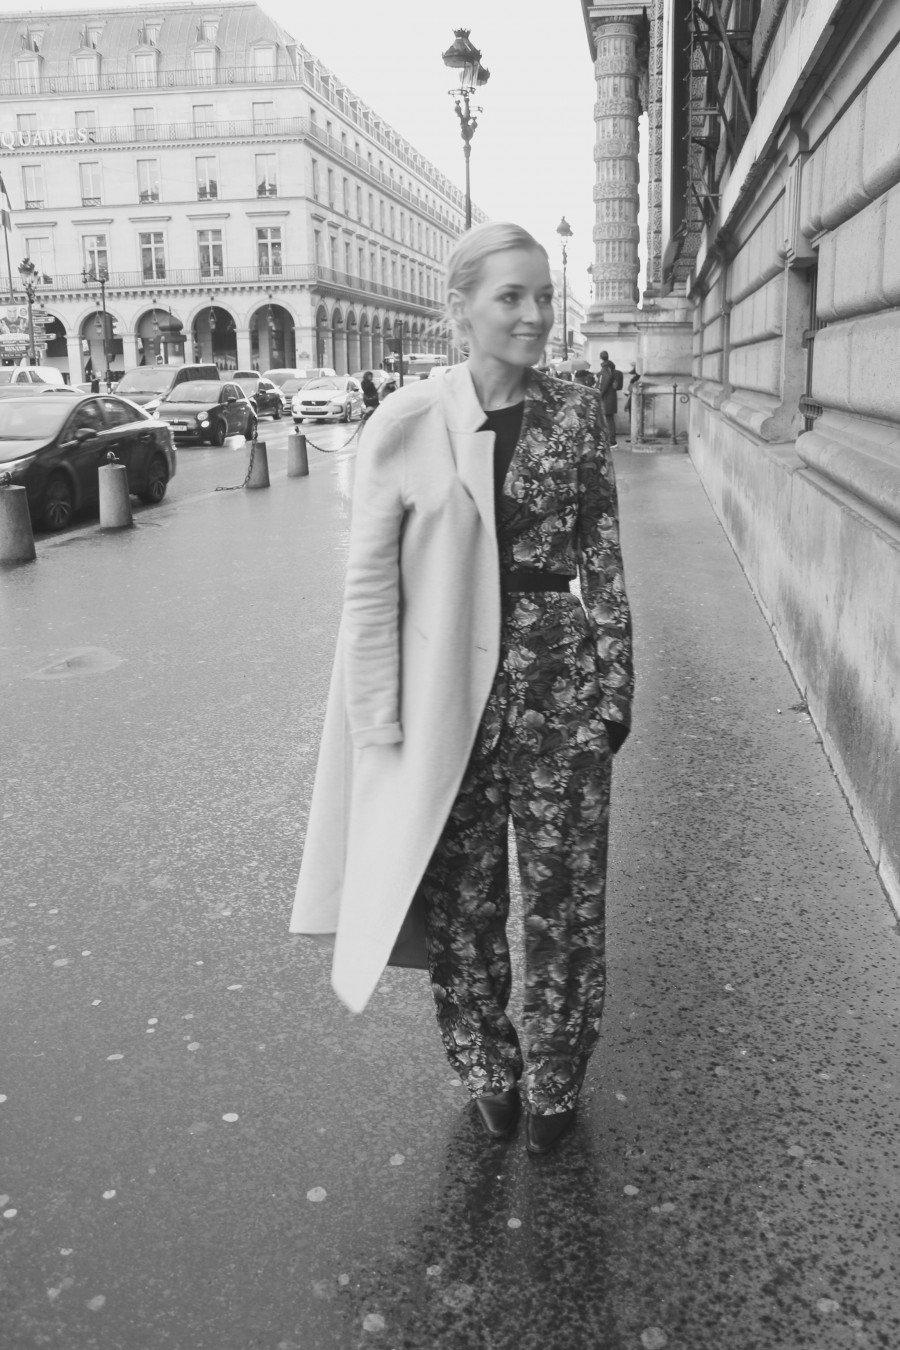 Musteranzug Gucci Zara Paris Fashionweek 2016